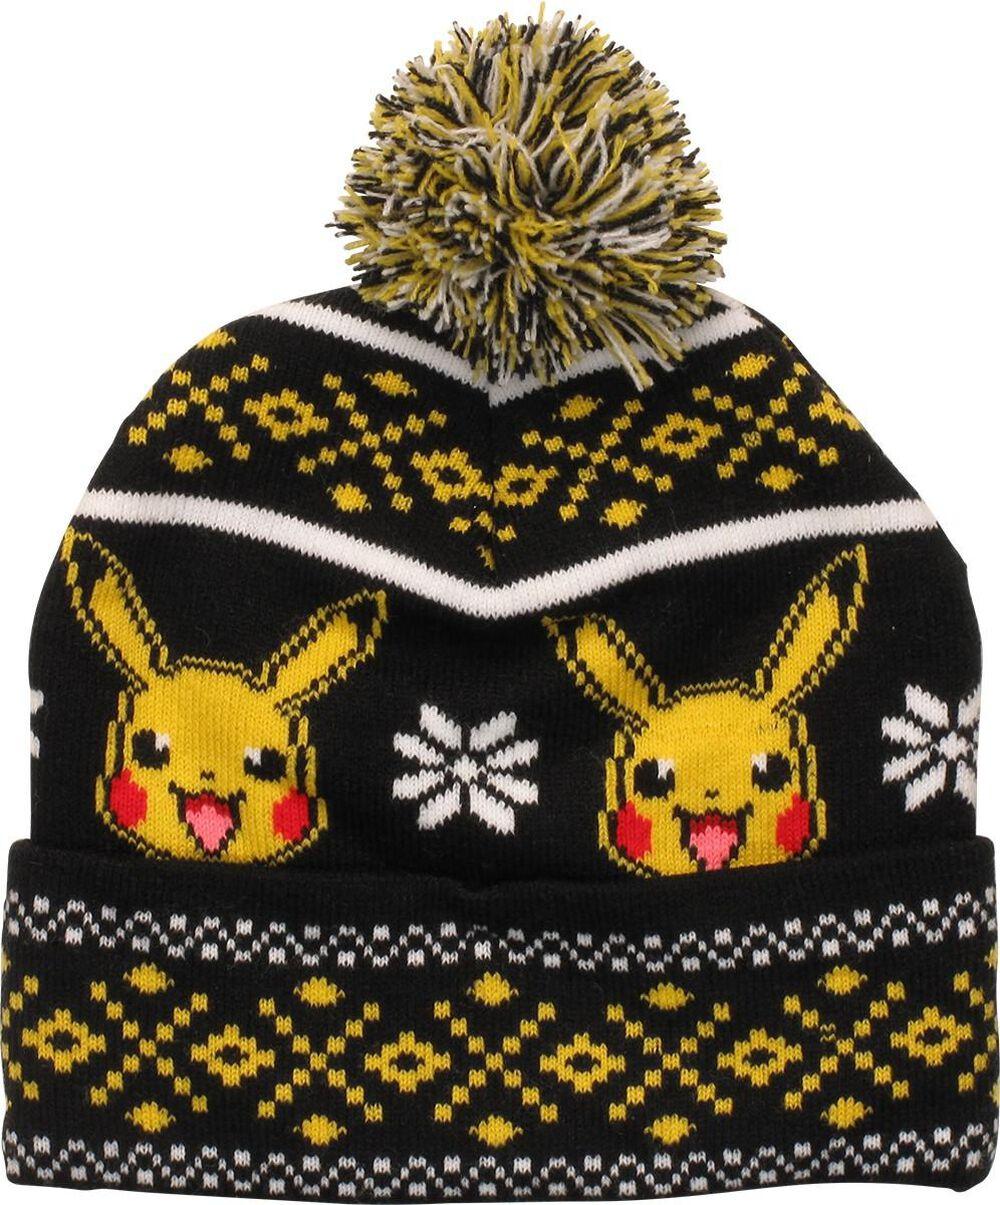 eaf39c5507b Images. Pokemon Pikachu Fair Isle Cuff Pom Beanie